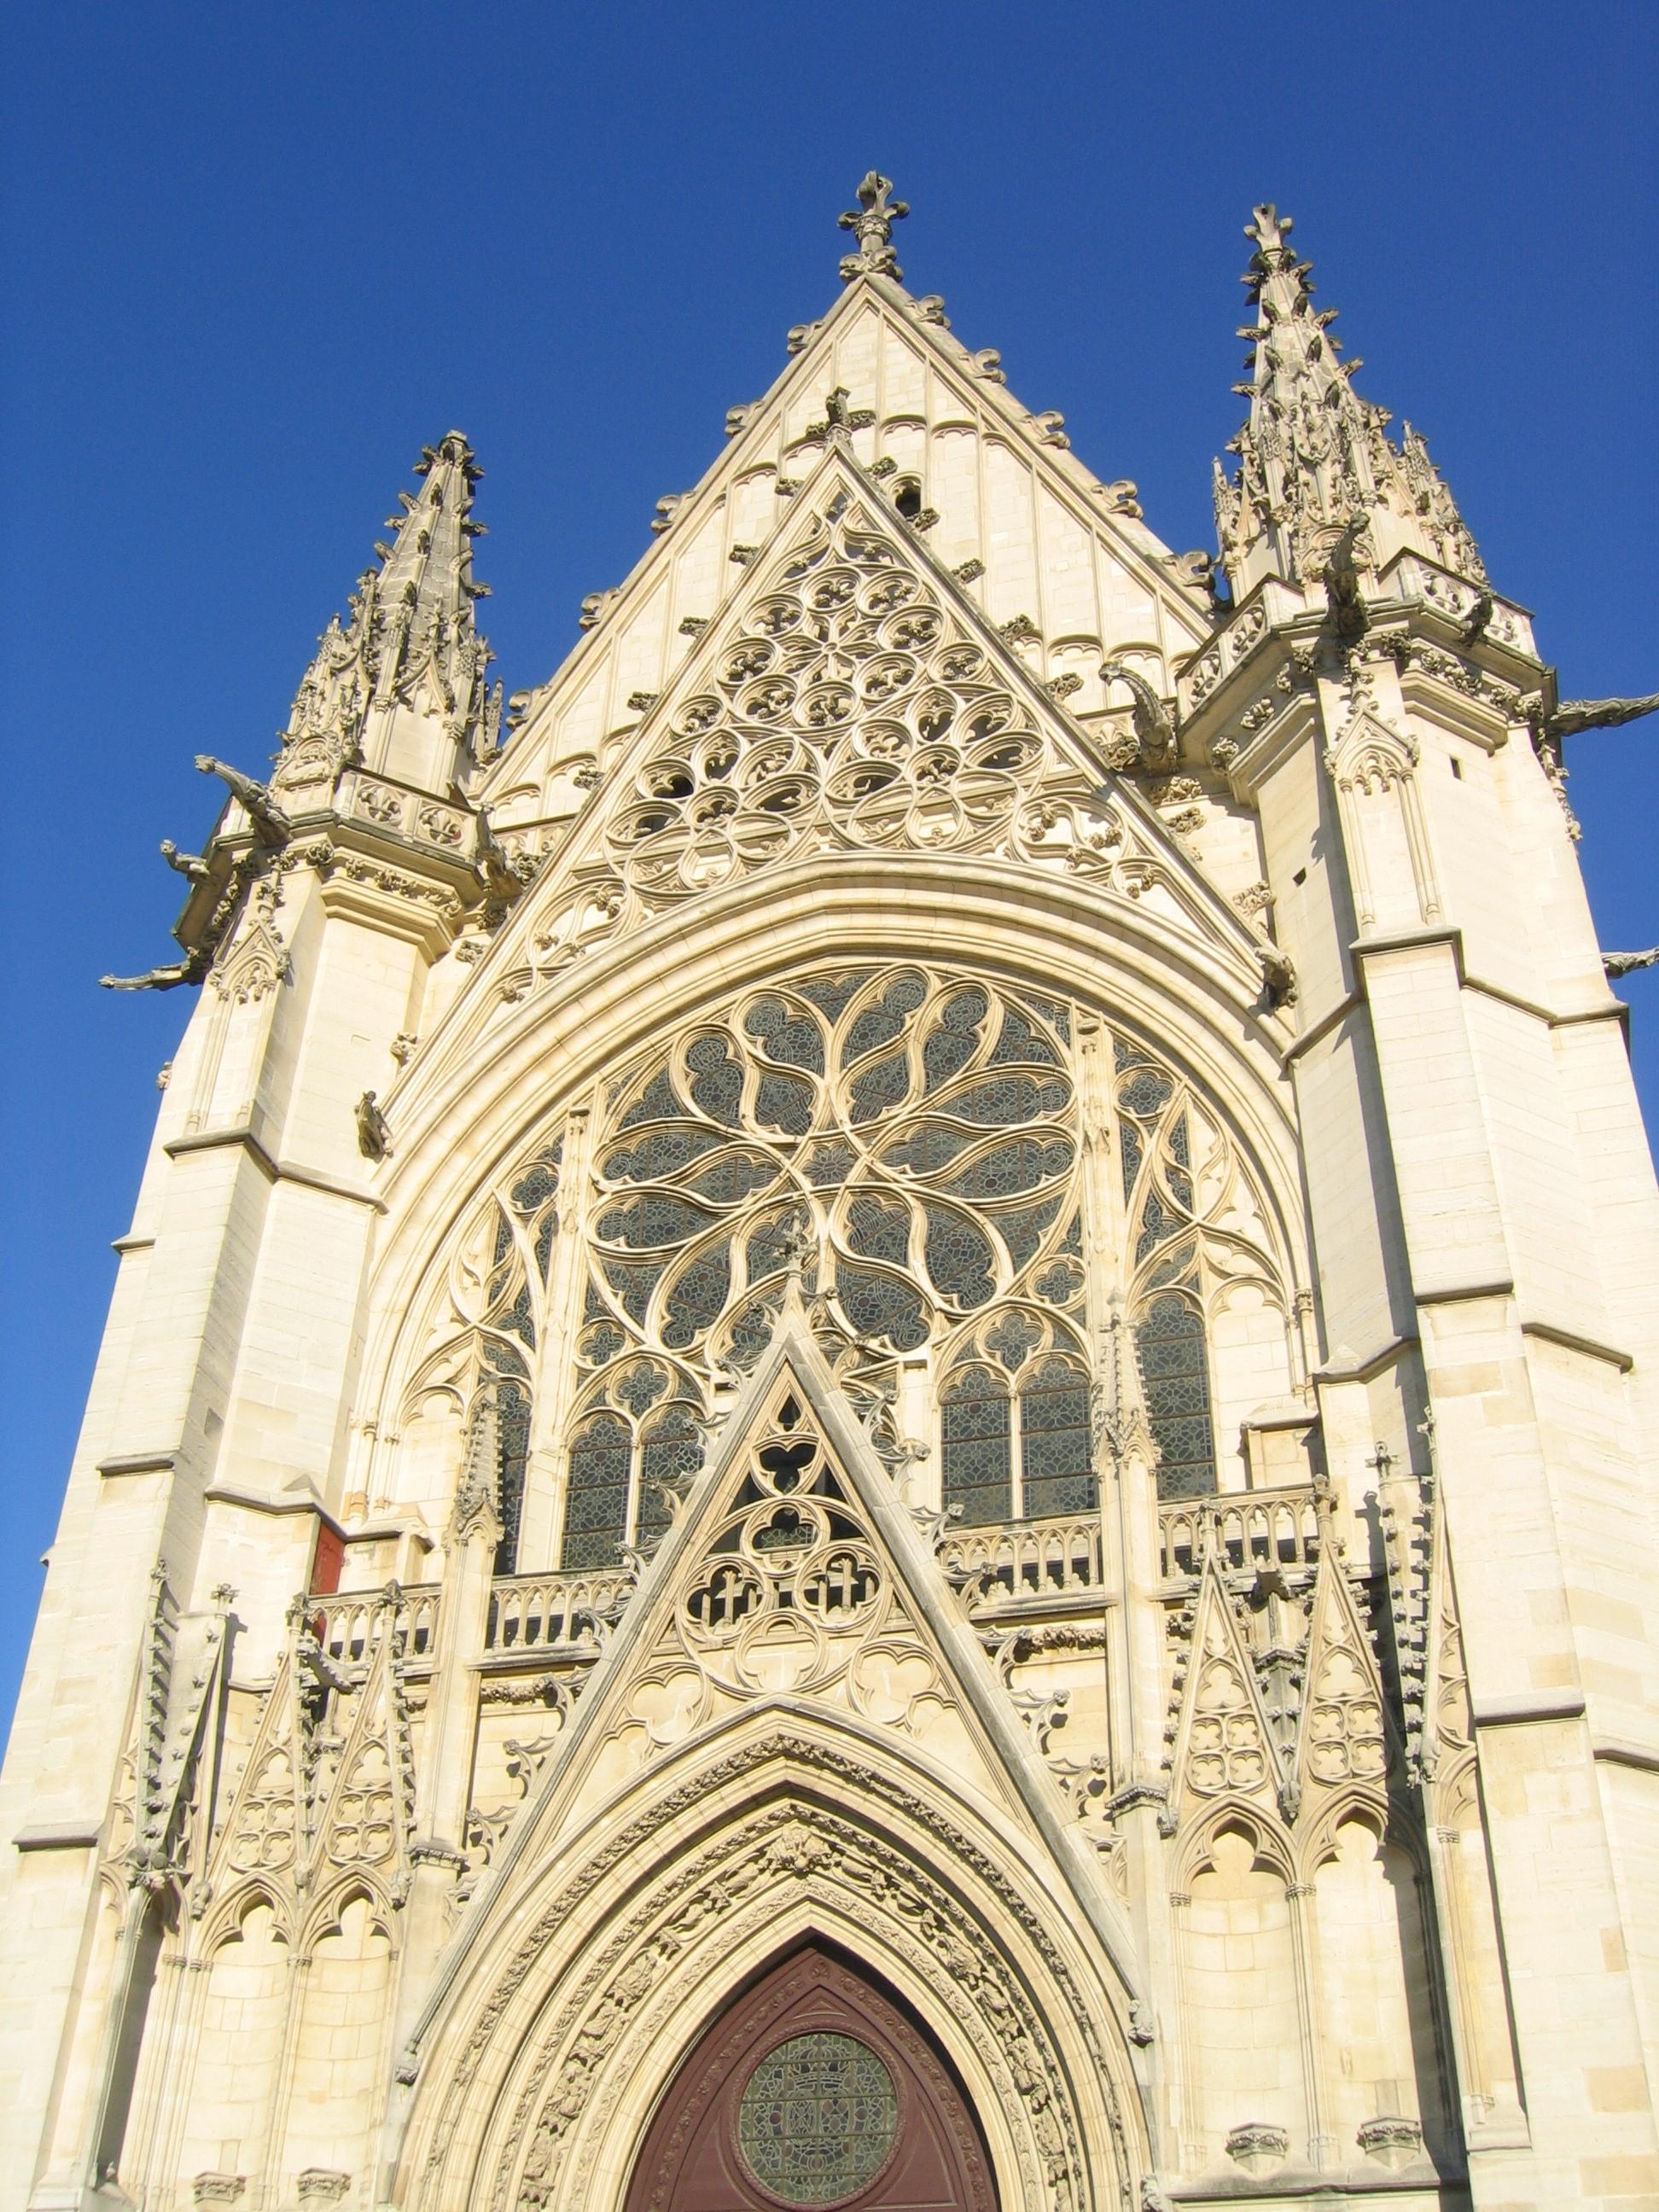 Architecture gothique for Architecture gothique definition